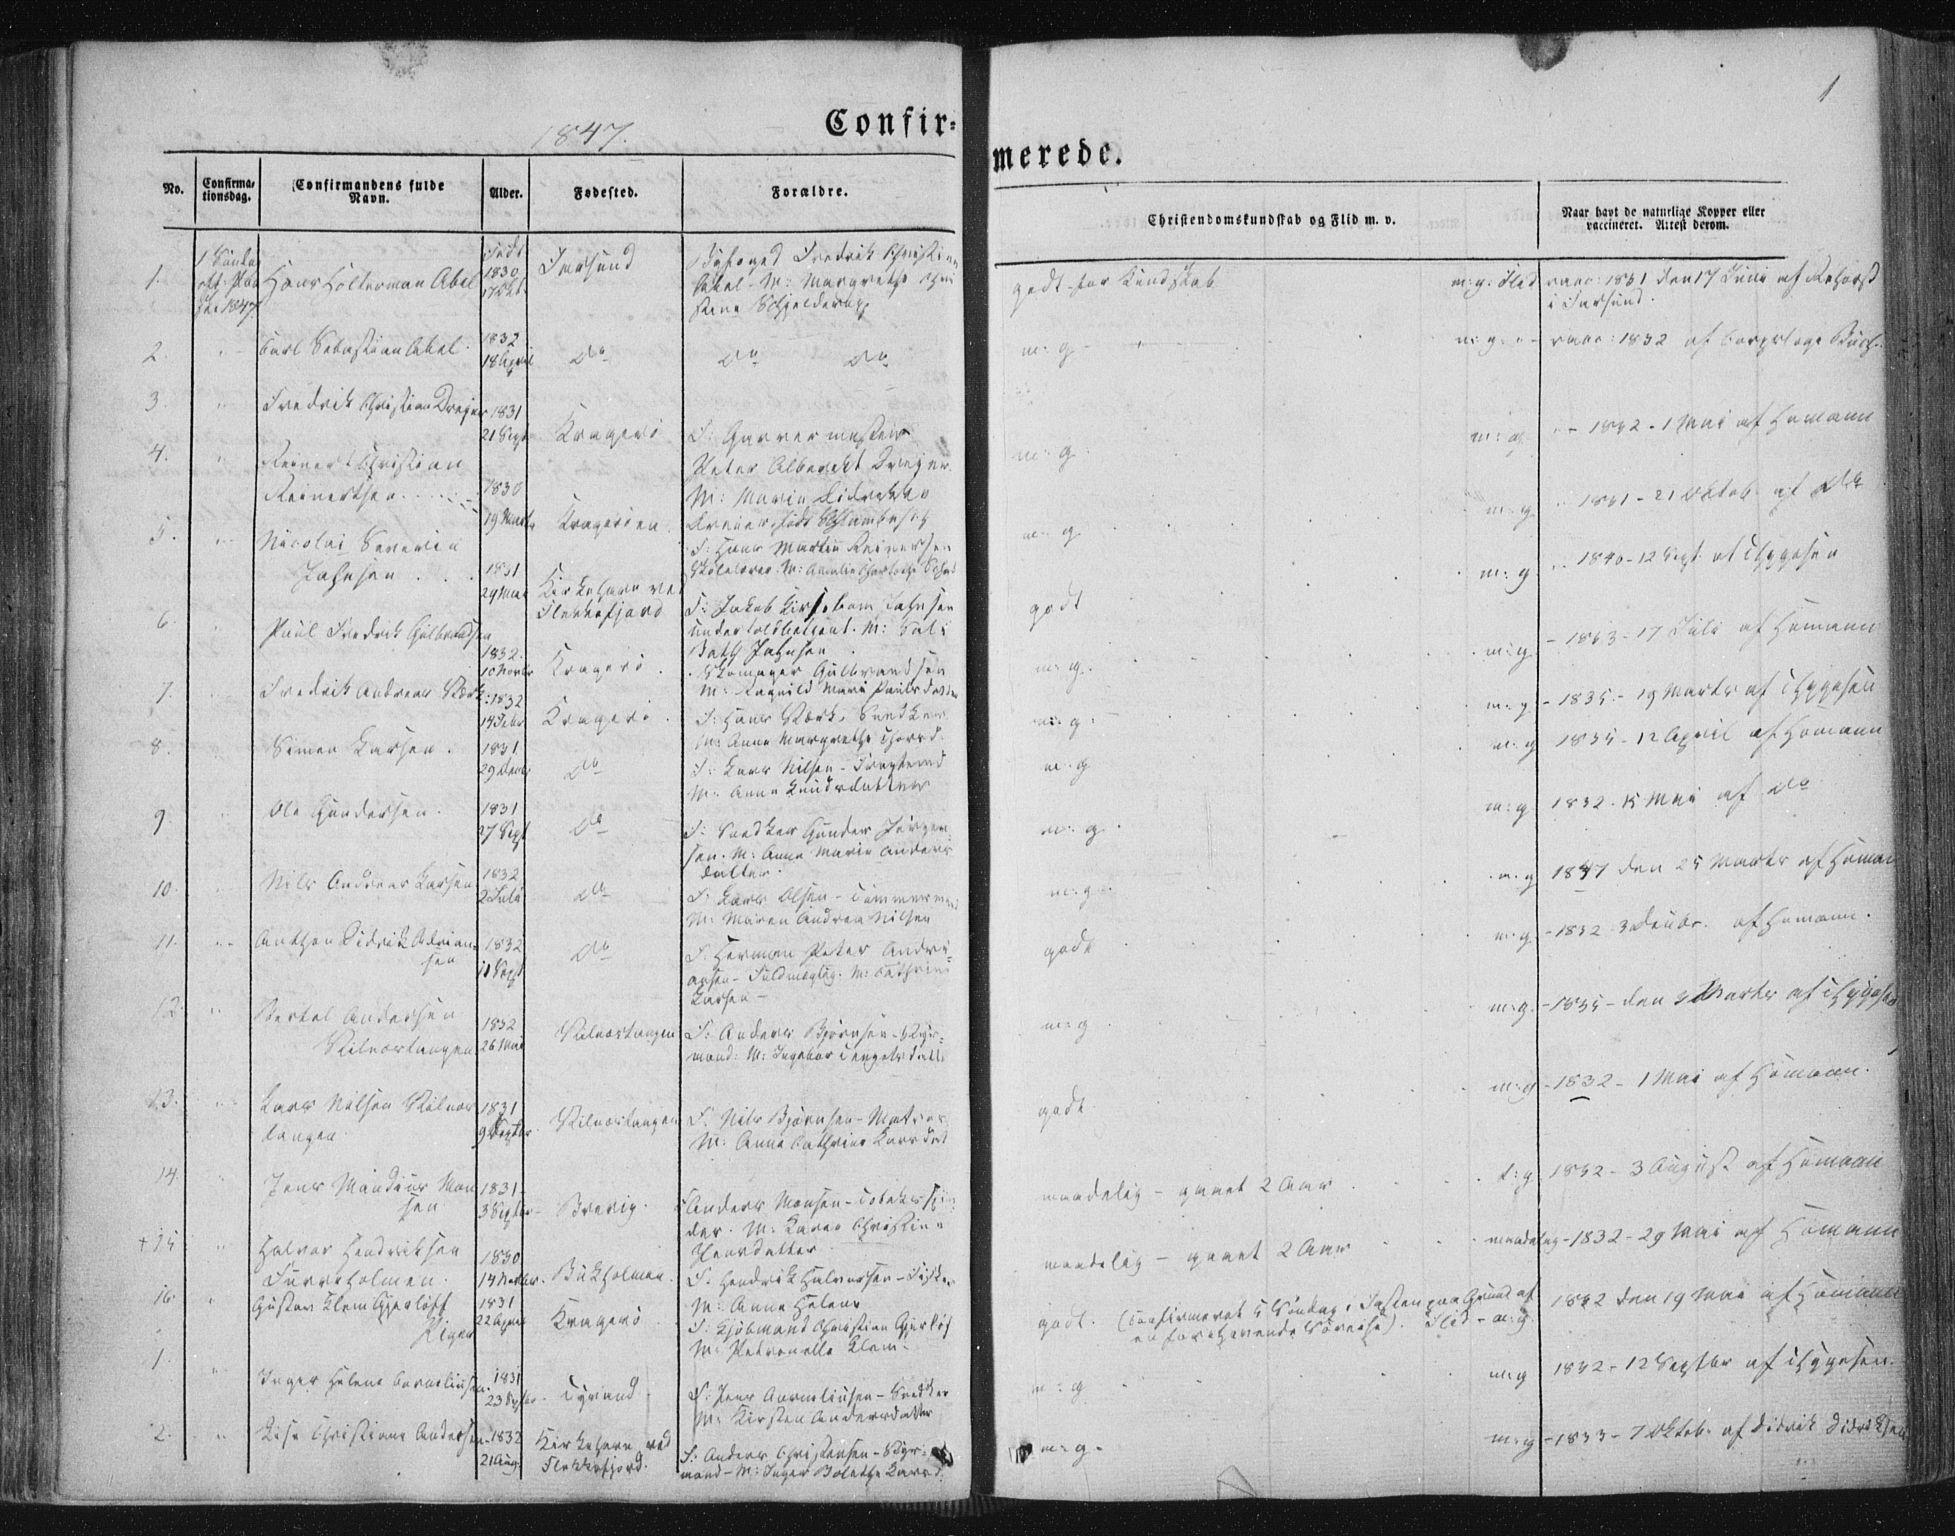 SAKO, Kragerø kirkebøker, F/Fa/L0006: Ministerialbok nr. 6, 1847-1861, s. 1